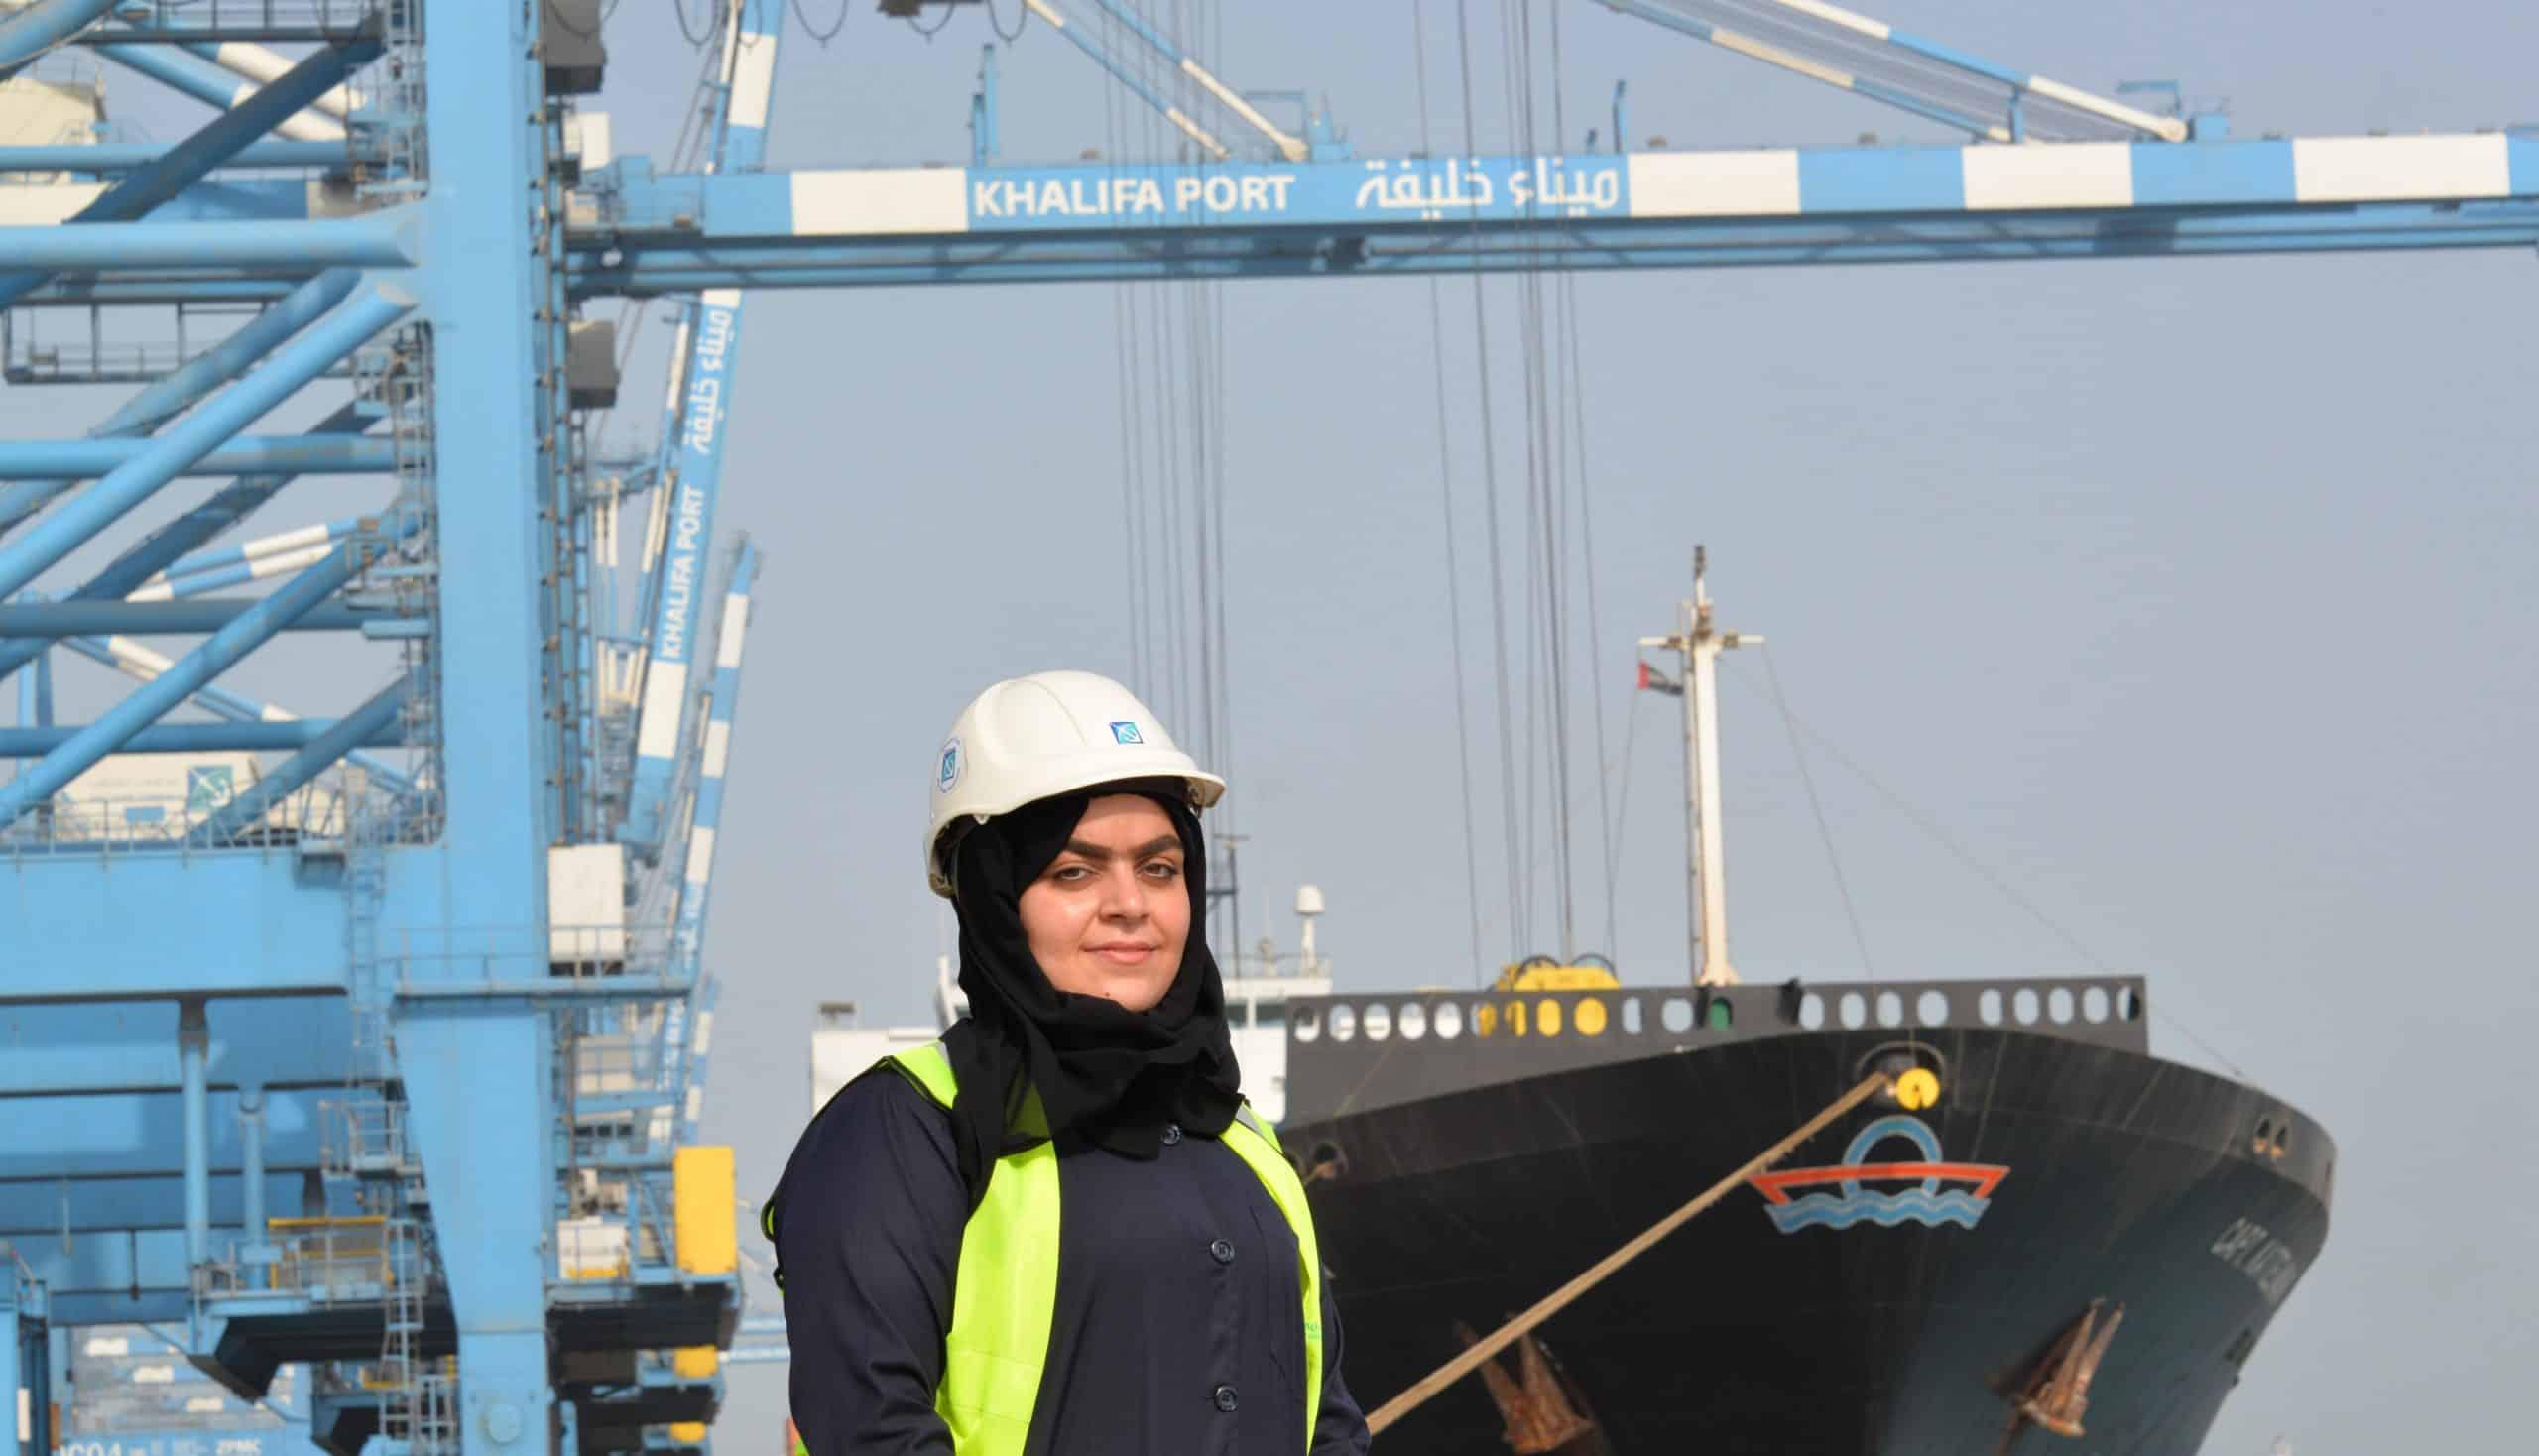 UAE's first female crane operator at Khalifa Port